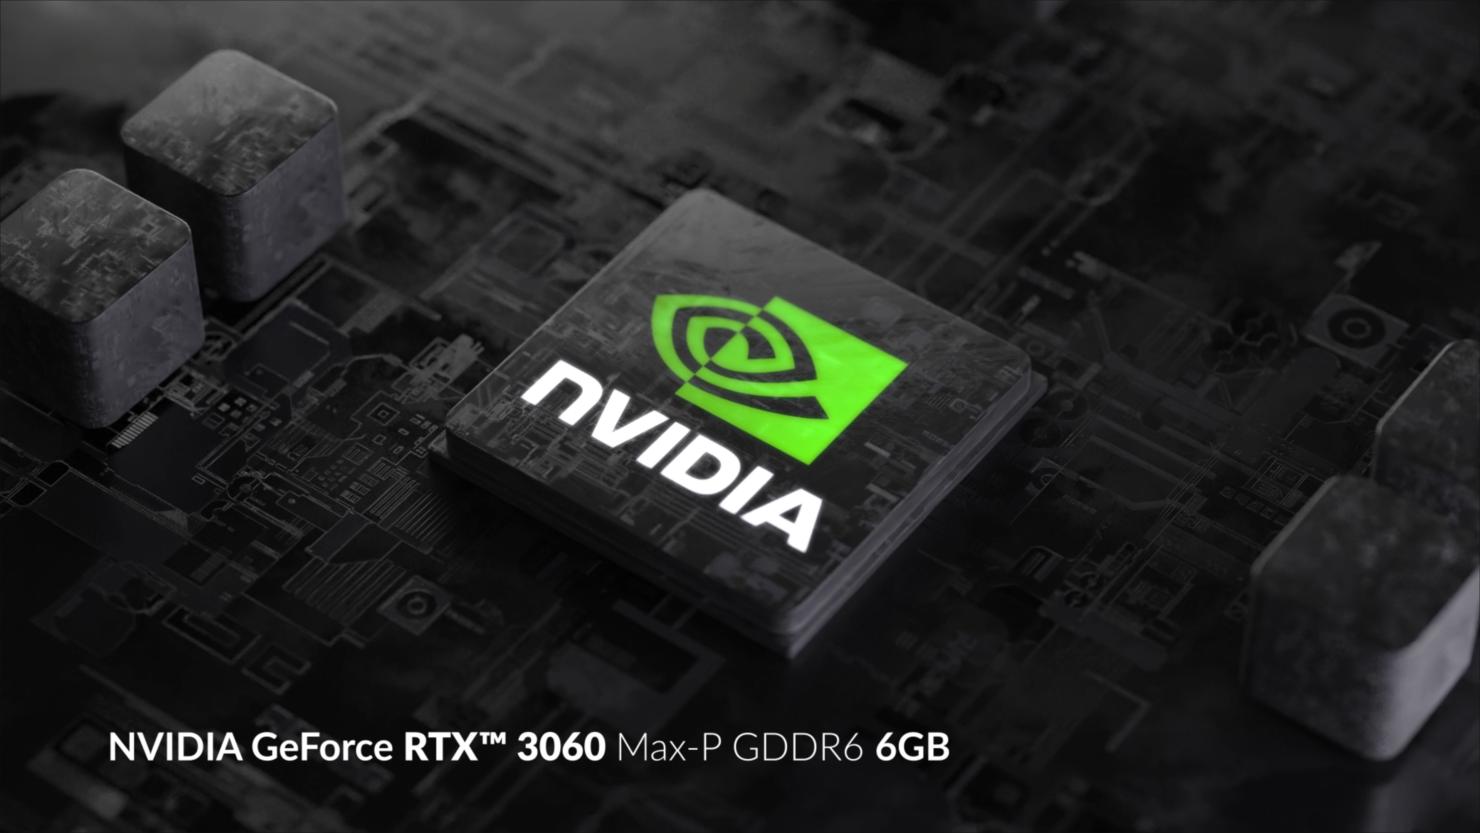 tachy-vortex-15-gaming-laptop-with-amd-ryzen-7-5800h-zen-3-cpu-nvidia-geforce-rtx-3060-6-gb-max-p-mobility-gpu-_6